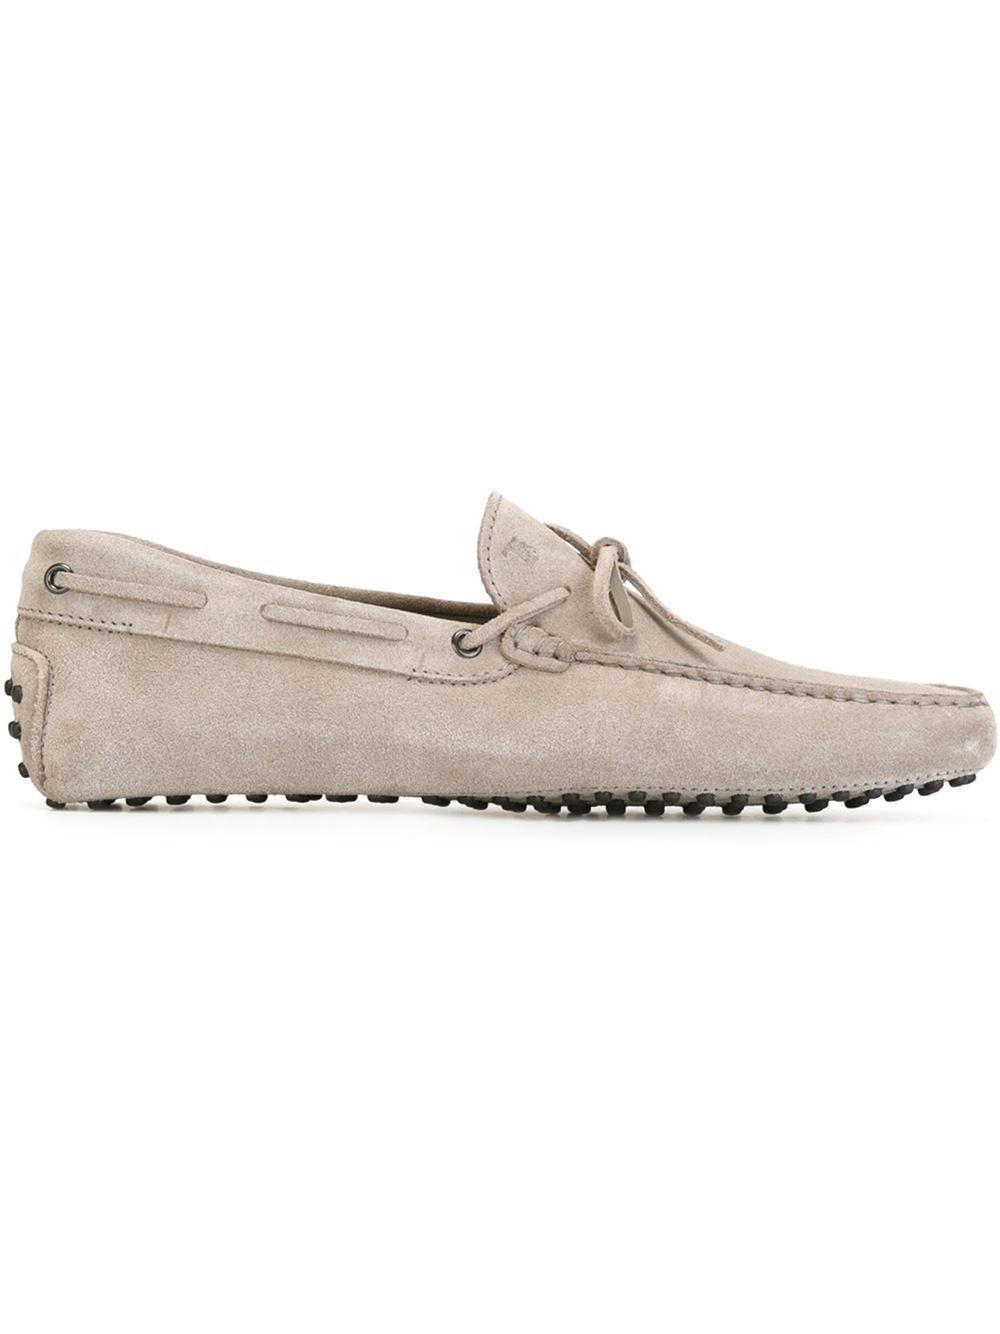 f575435b964 Tod s zapatos drive